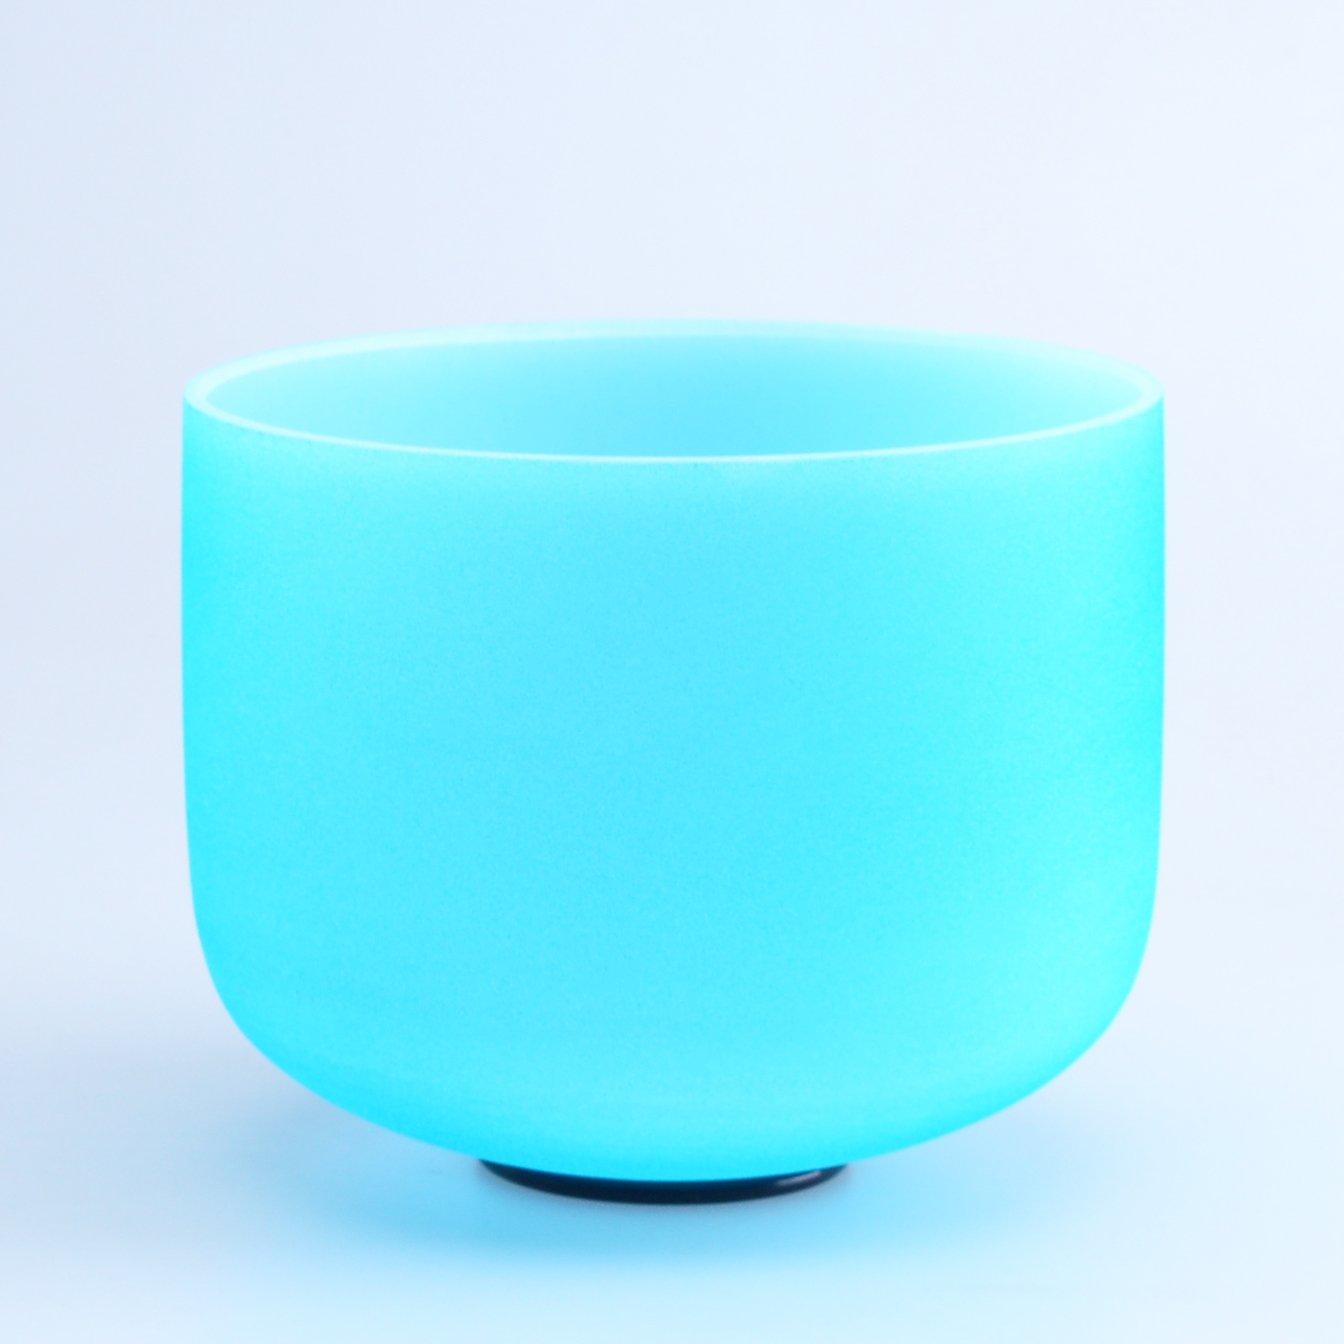 440HZ 8'' G Throat Blue Chakra Quartz Crystal Singing Bowl by Donghai Quartz